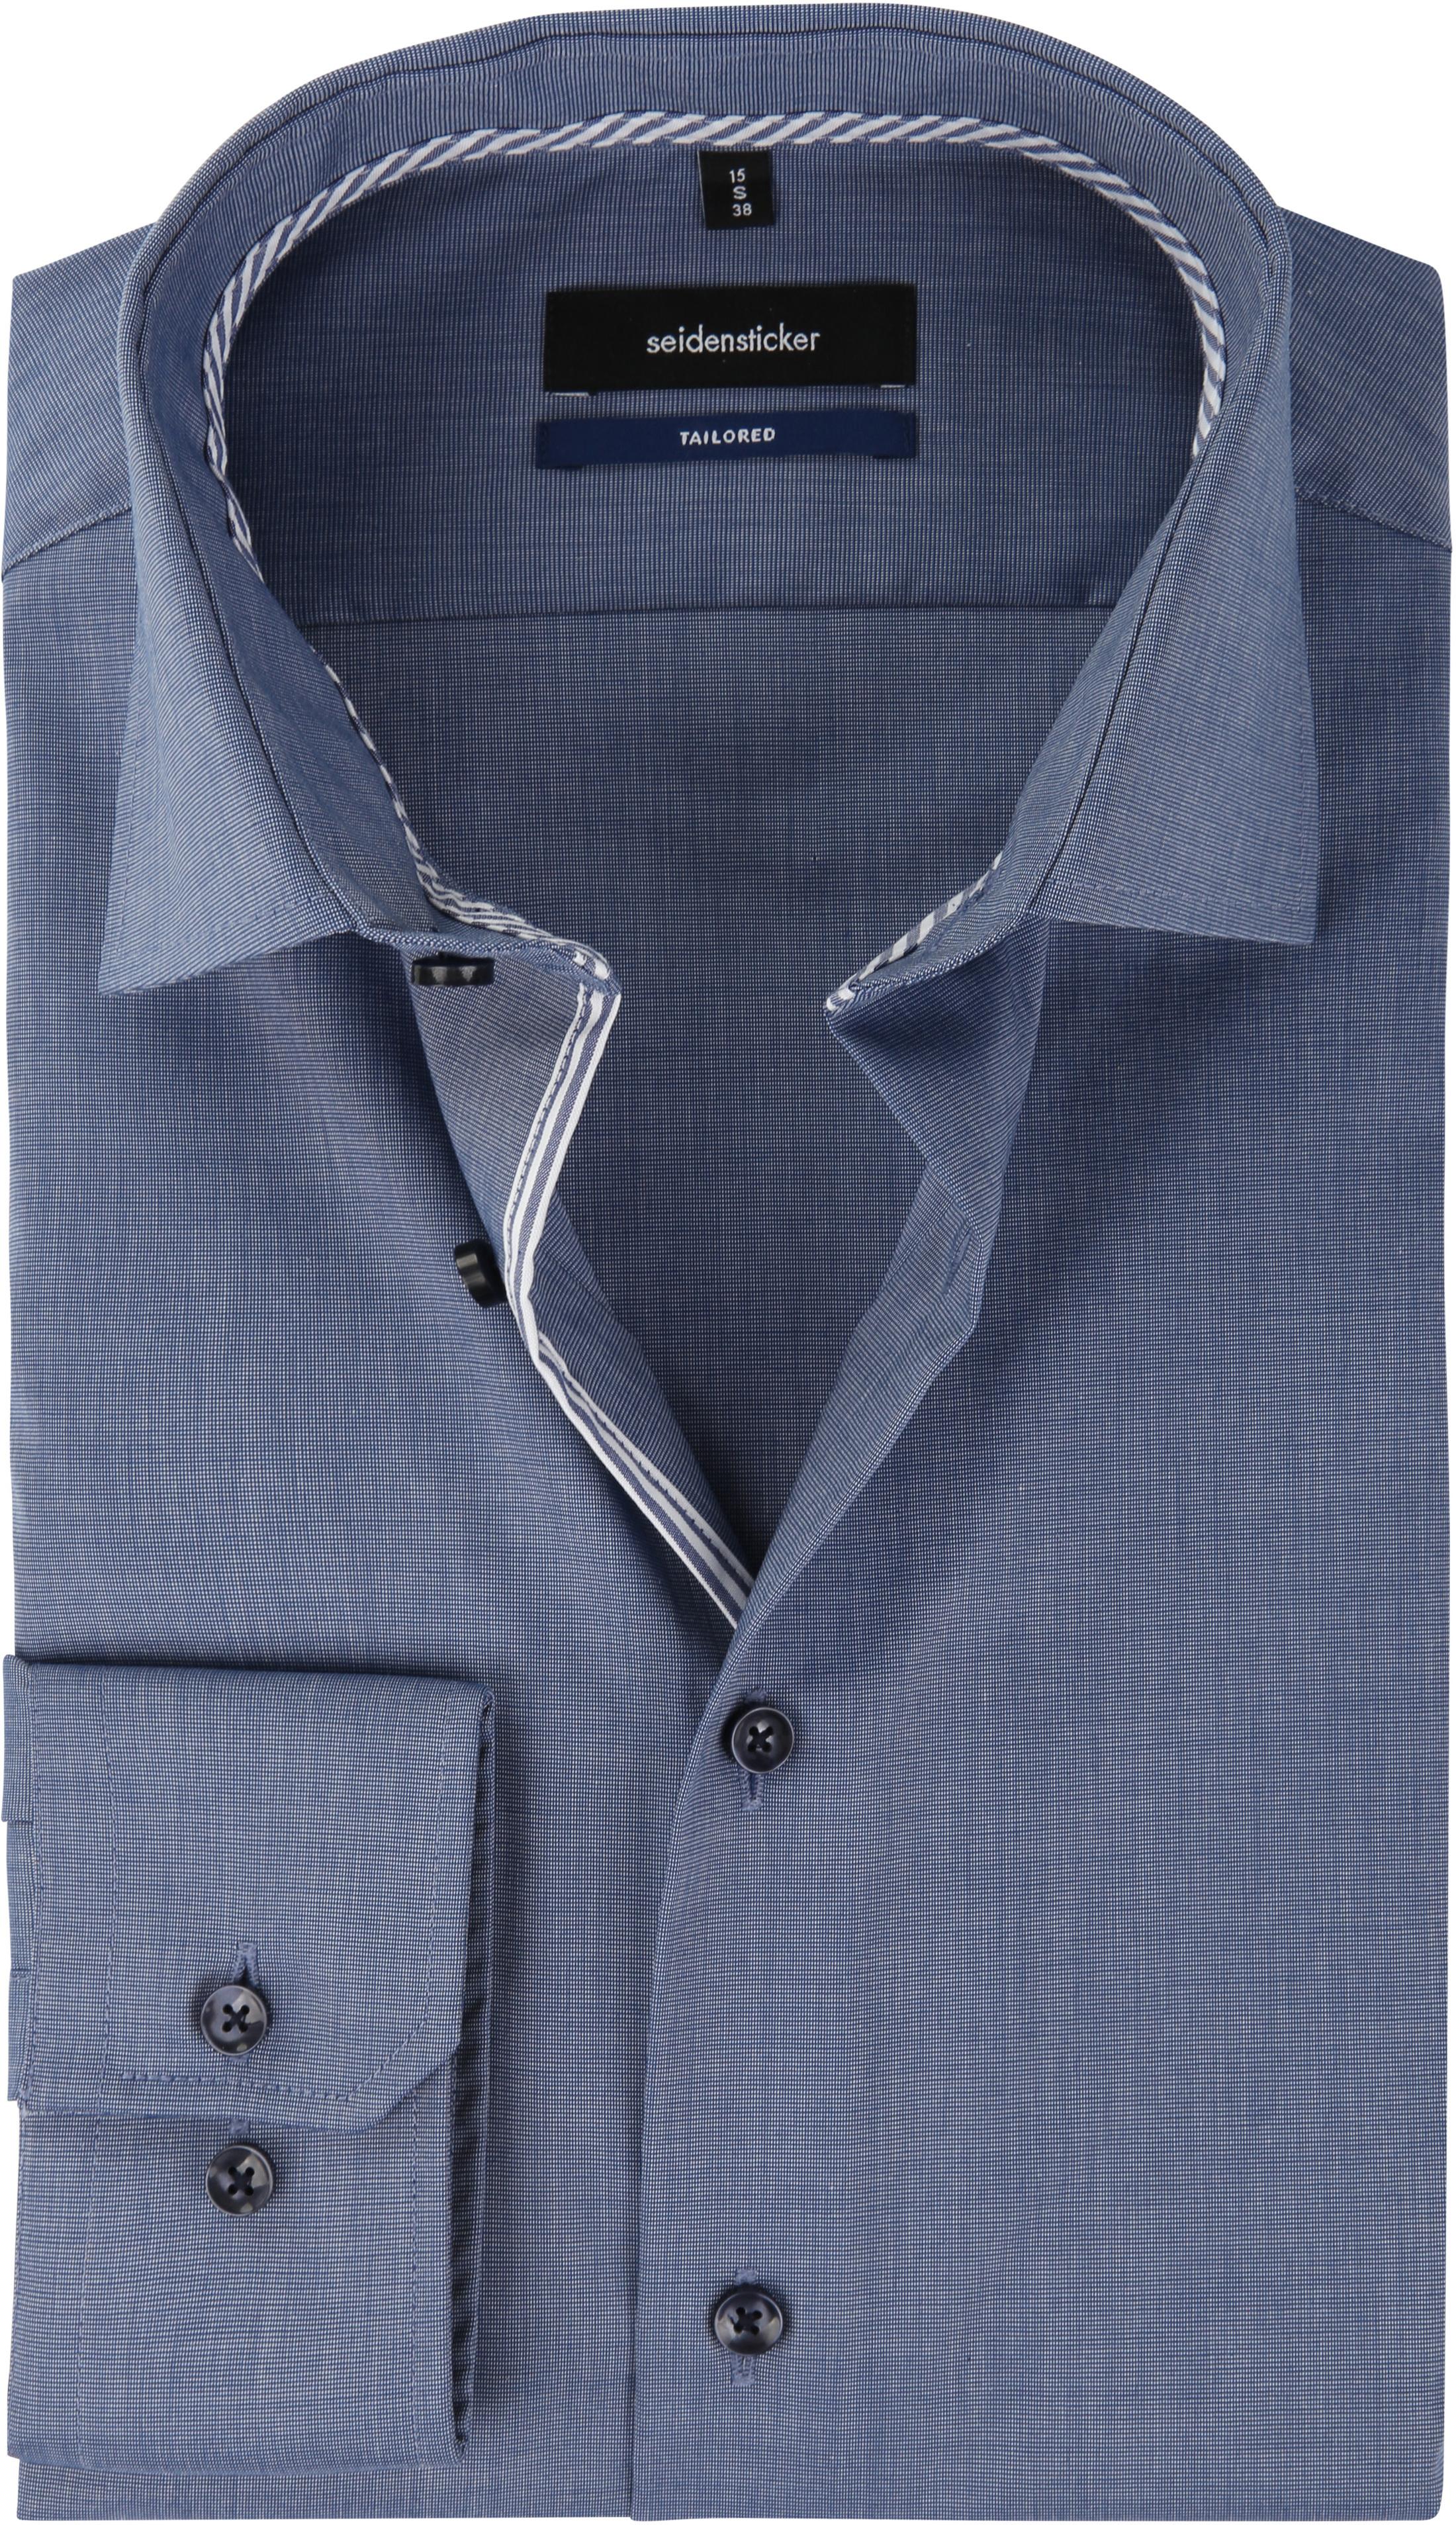 Seidensticker Overhemd Tailor-Fit 936 foto 0